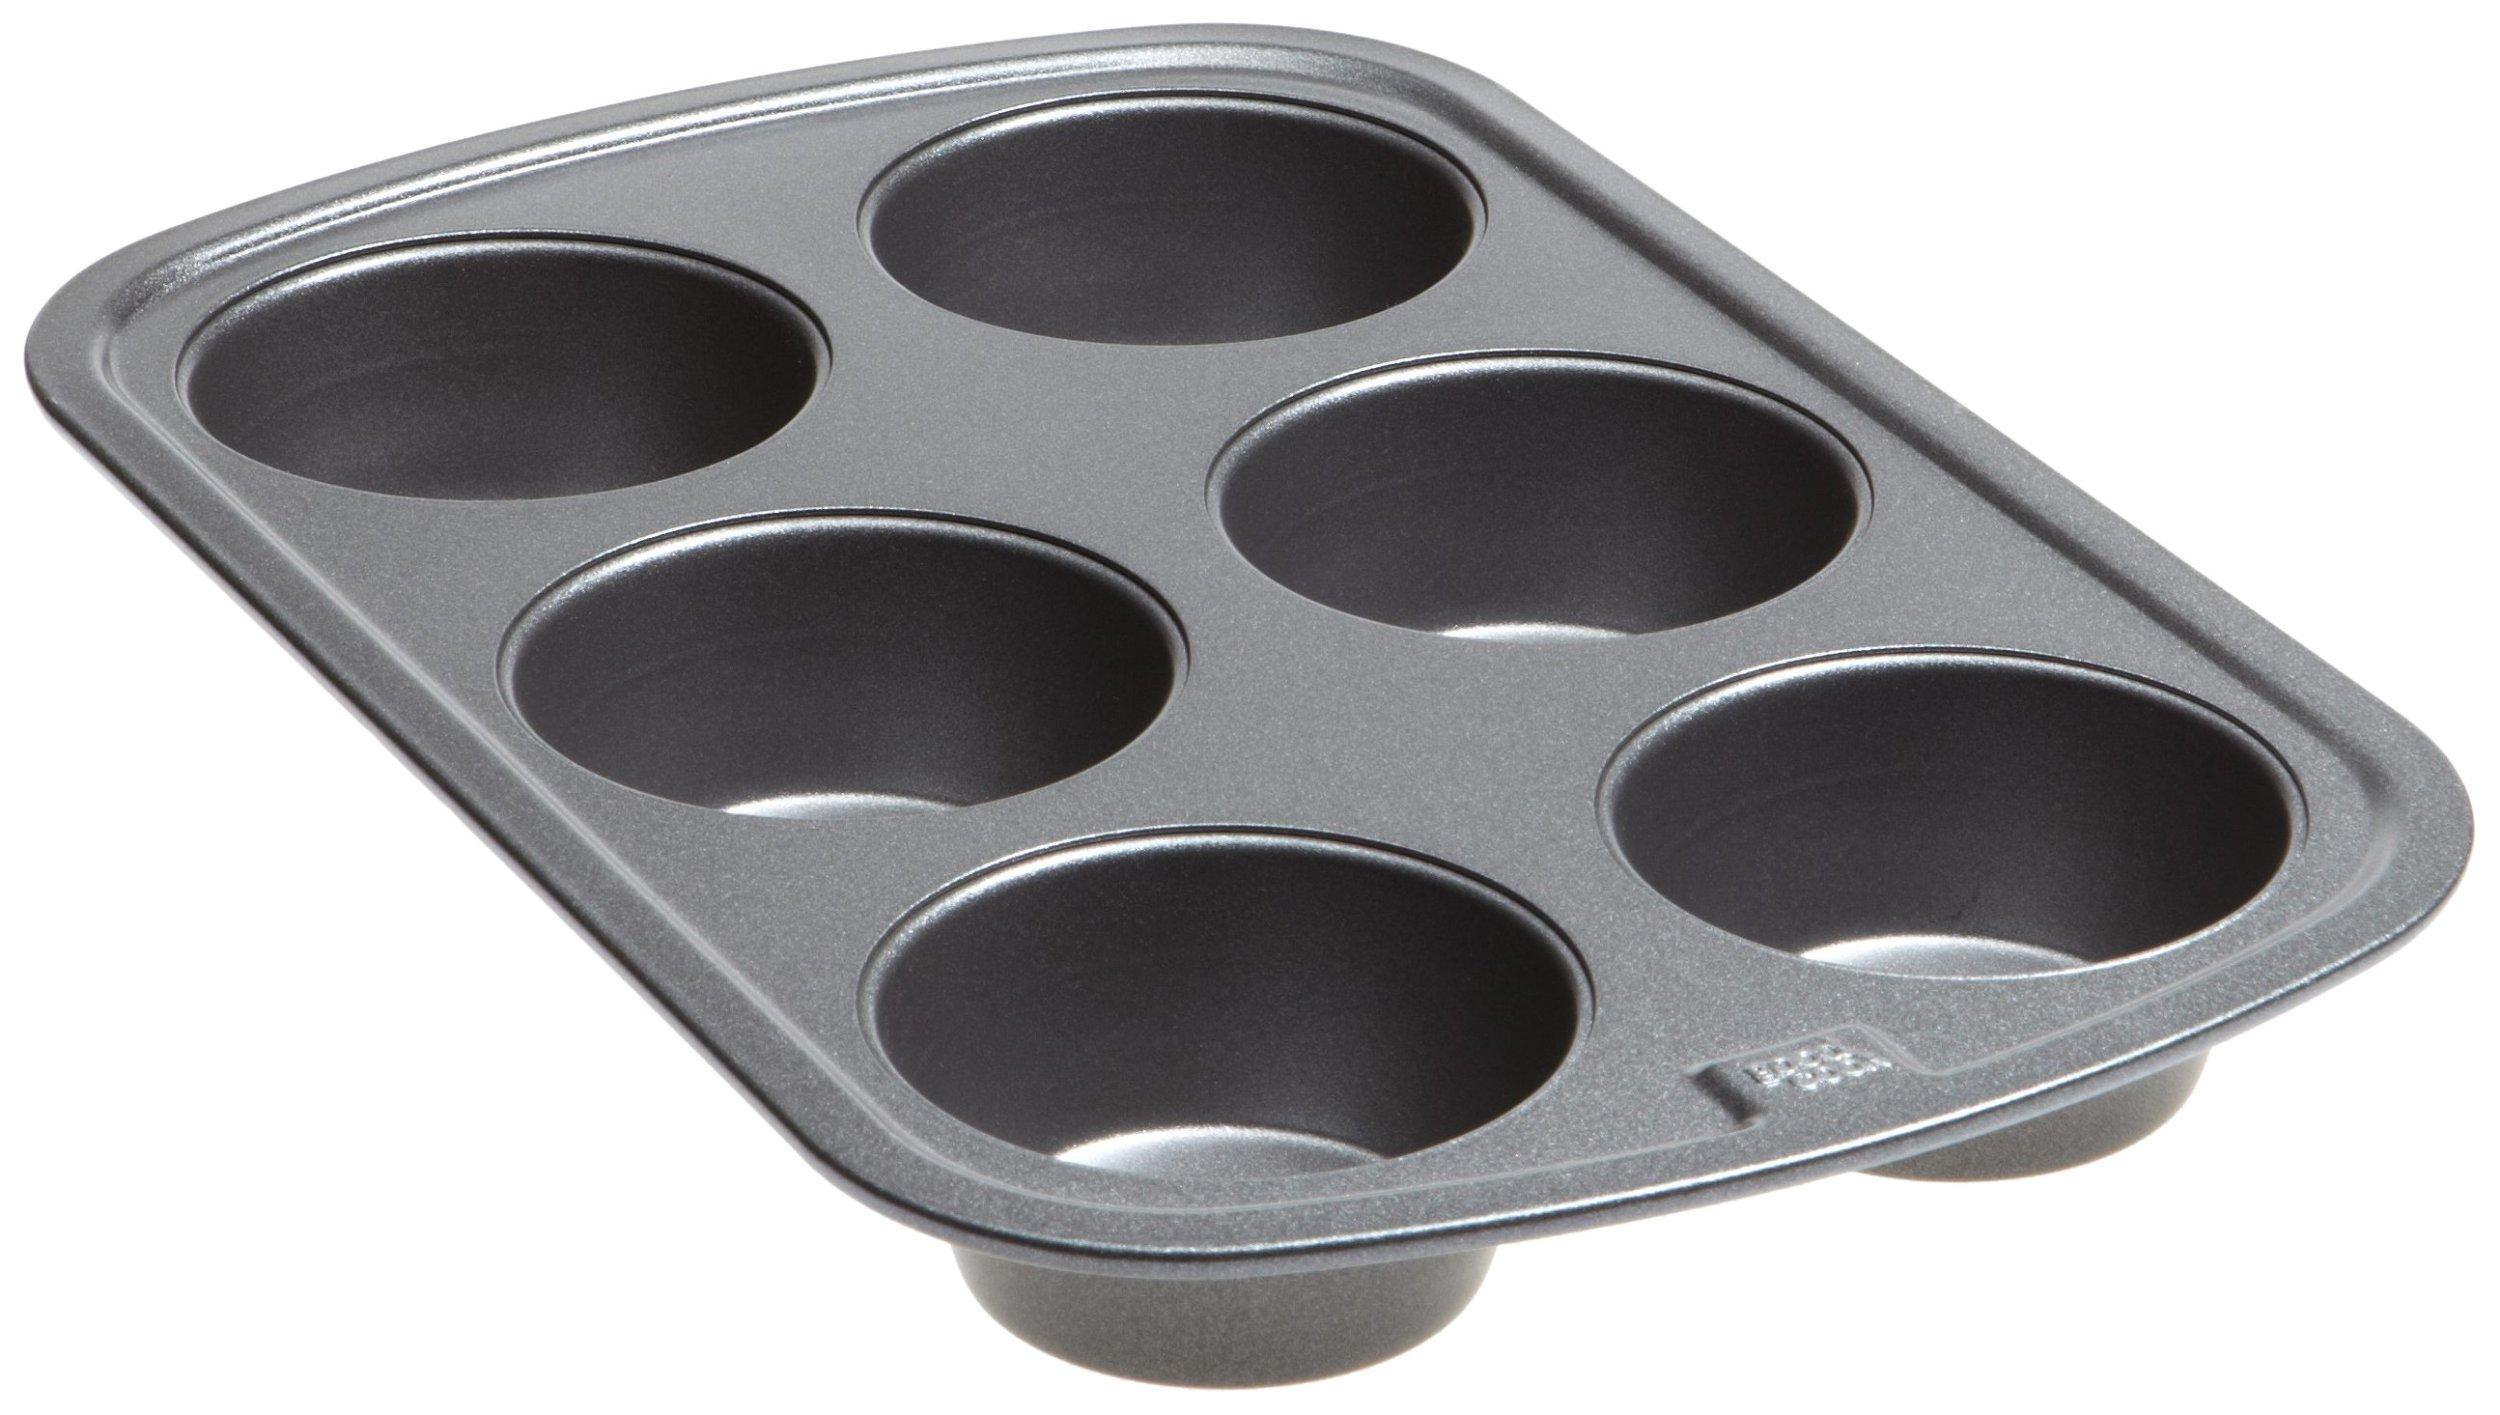 Good Cook 04030 4030 Muffin Pan 2-3/4 in Dia x 14-1/2 in L x 8-1/2 in W x 6.8 in H